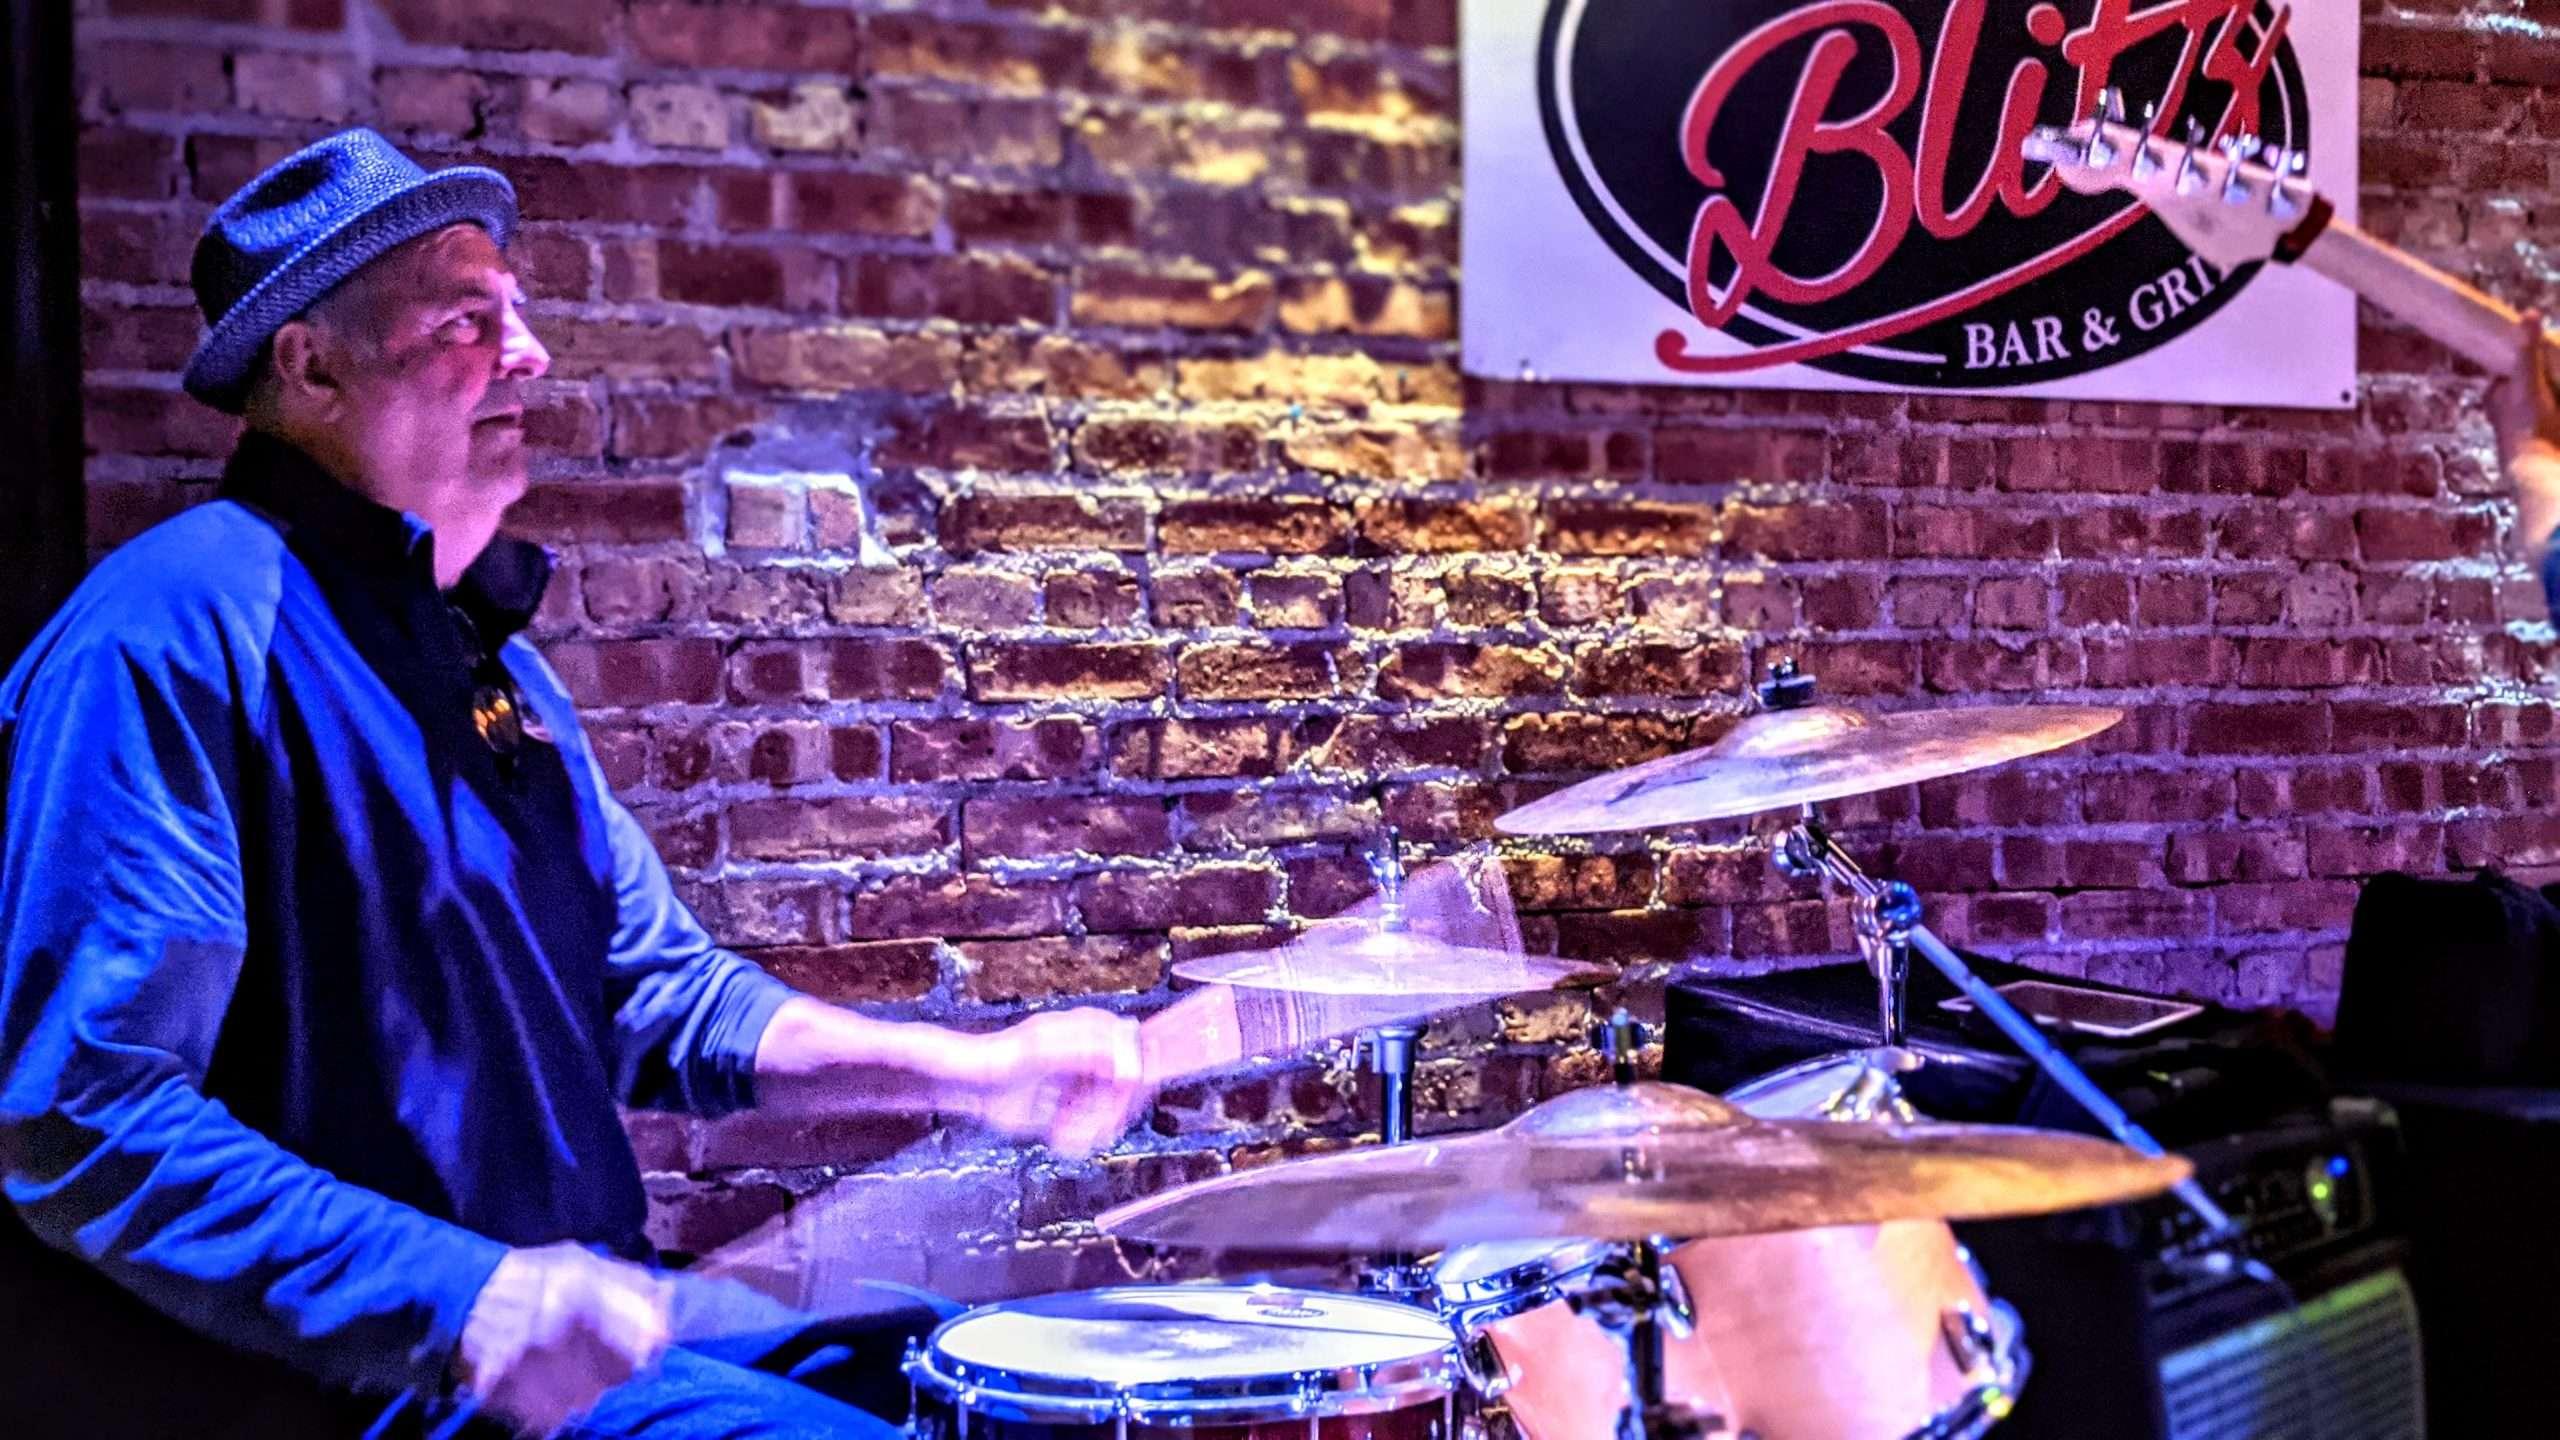 Brian's Open Mic Experiences At Johnny's Blitz Bar & Grill 12